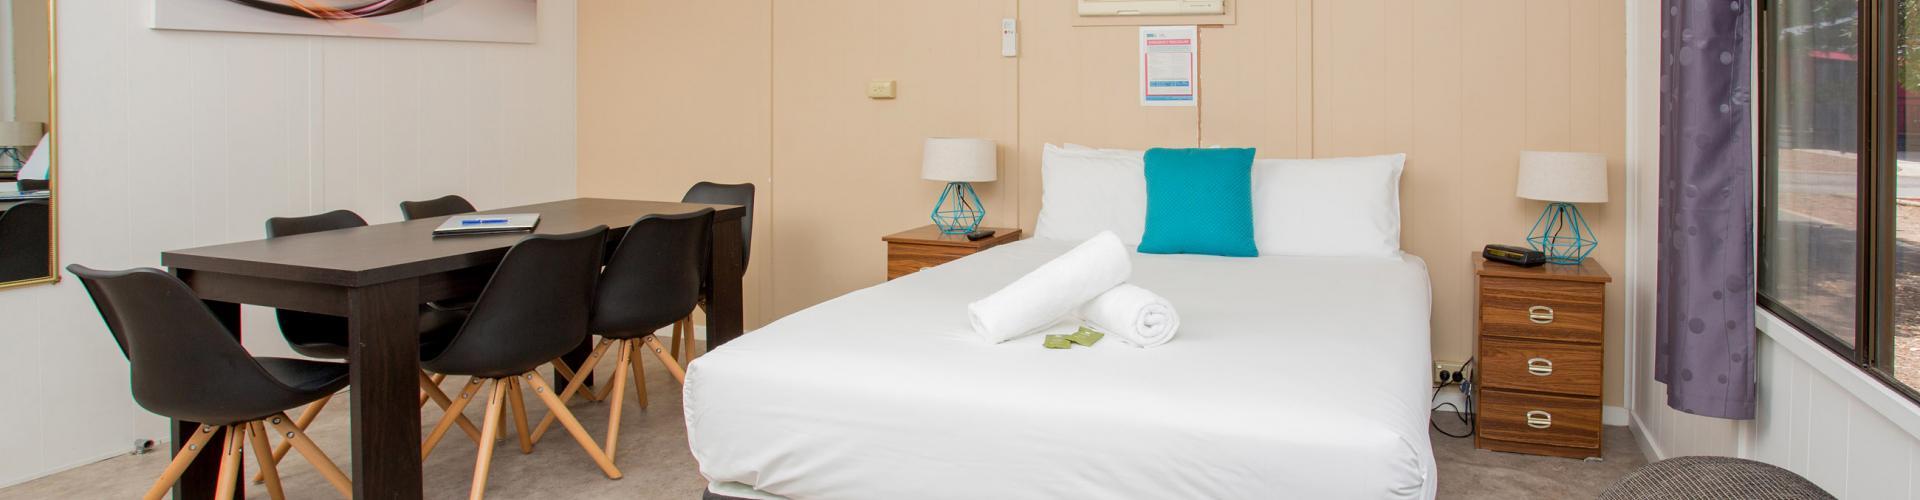 BIG4 Shepparton Park Lane Holiday Park - Family Cabin - Bedroom